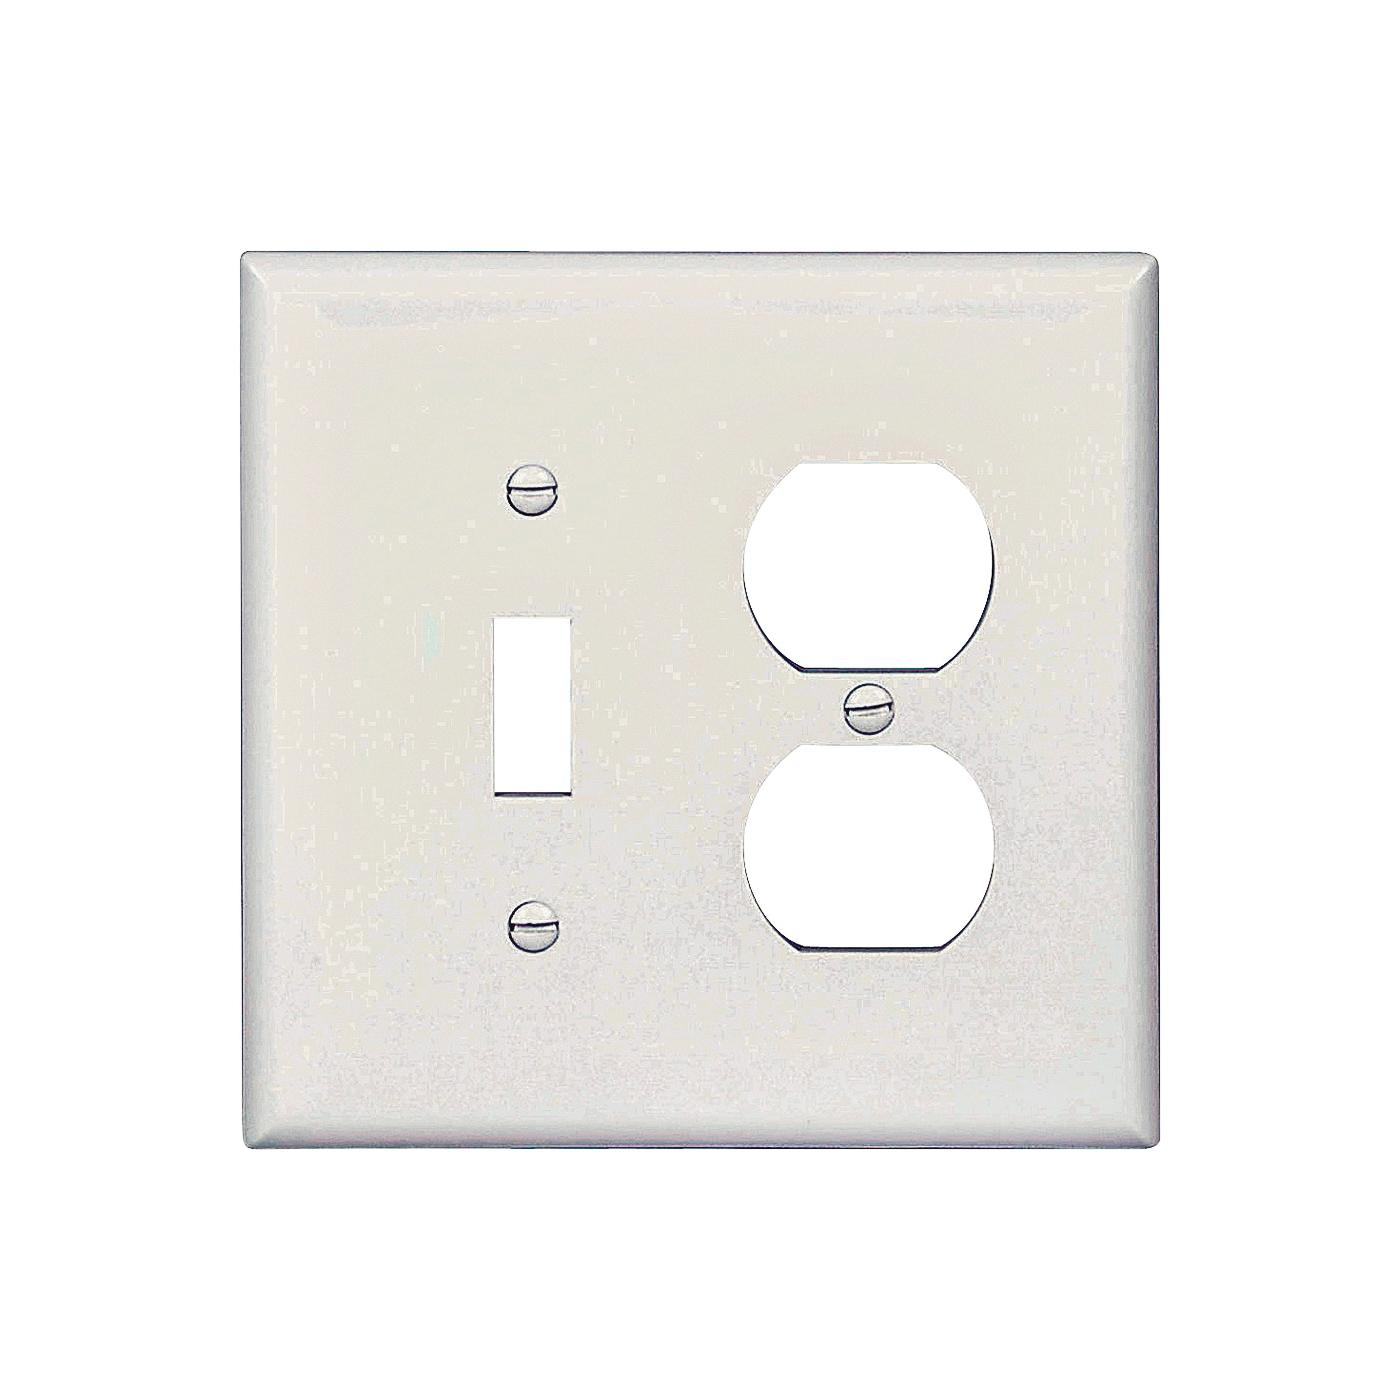 Eaton Wiring Devices PJ18W